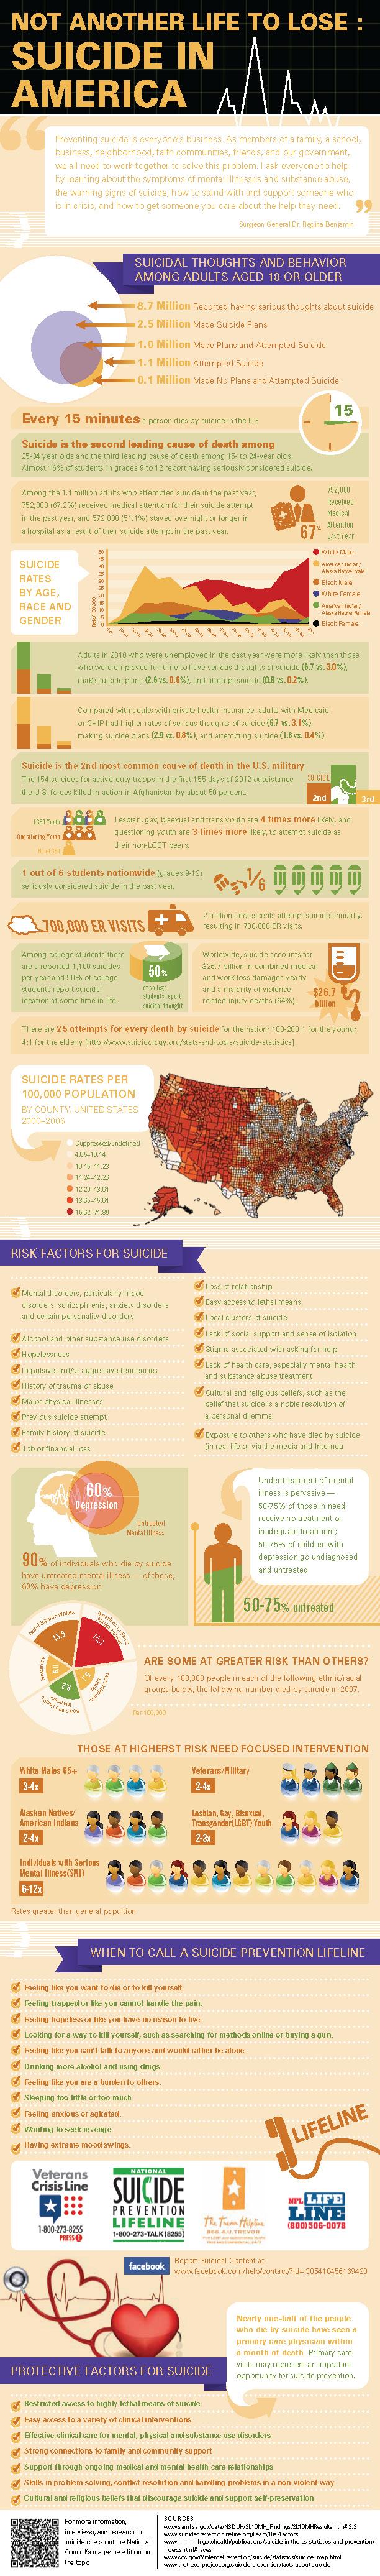 Suicide in America Statistics-Infographic